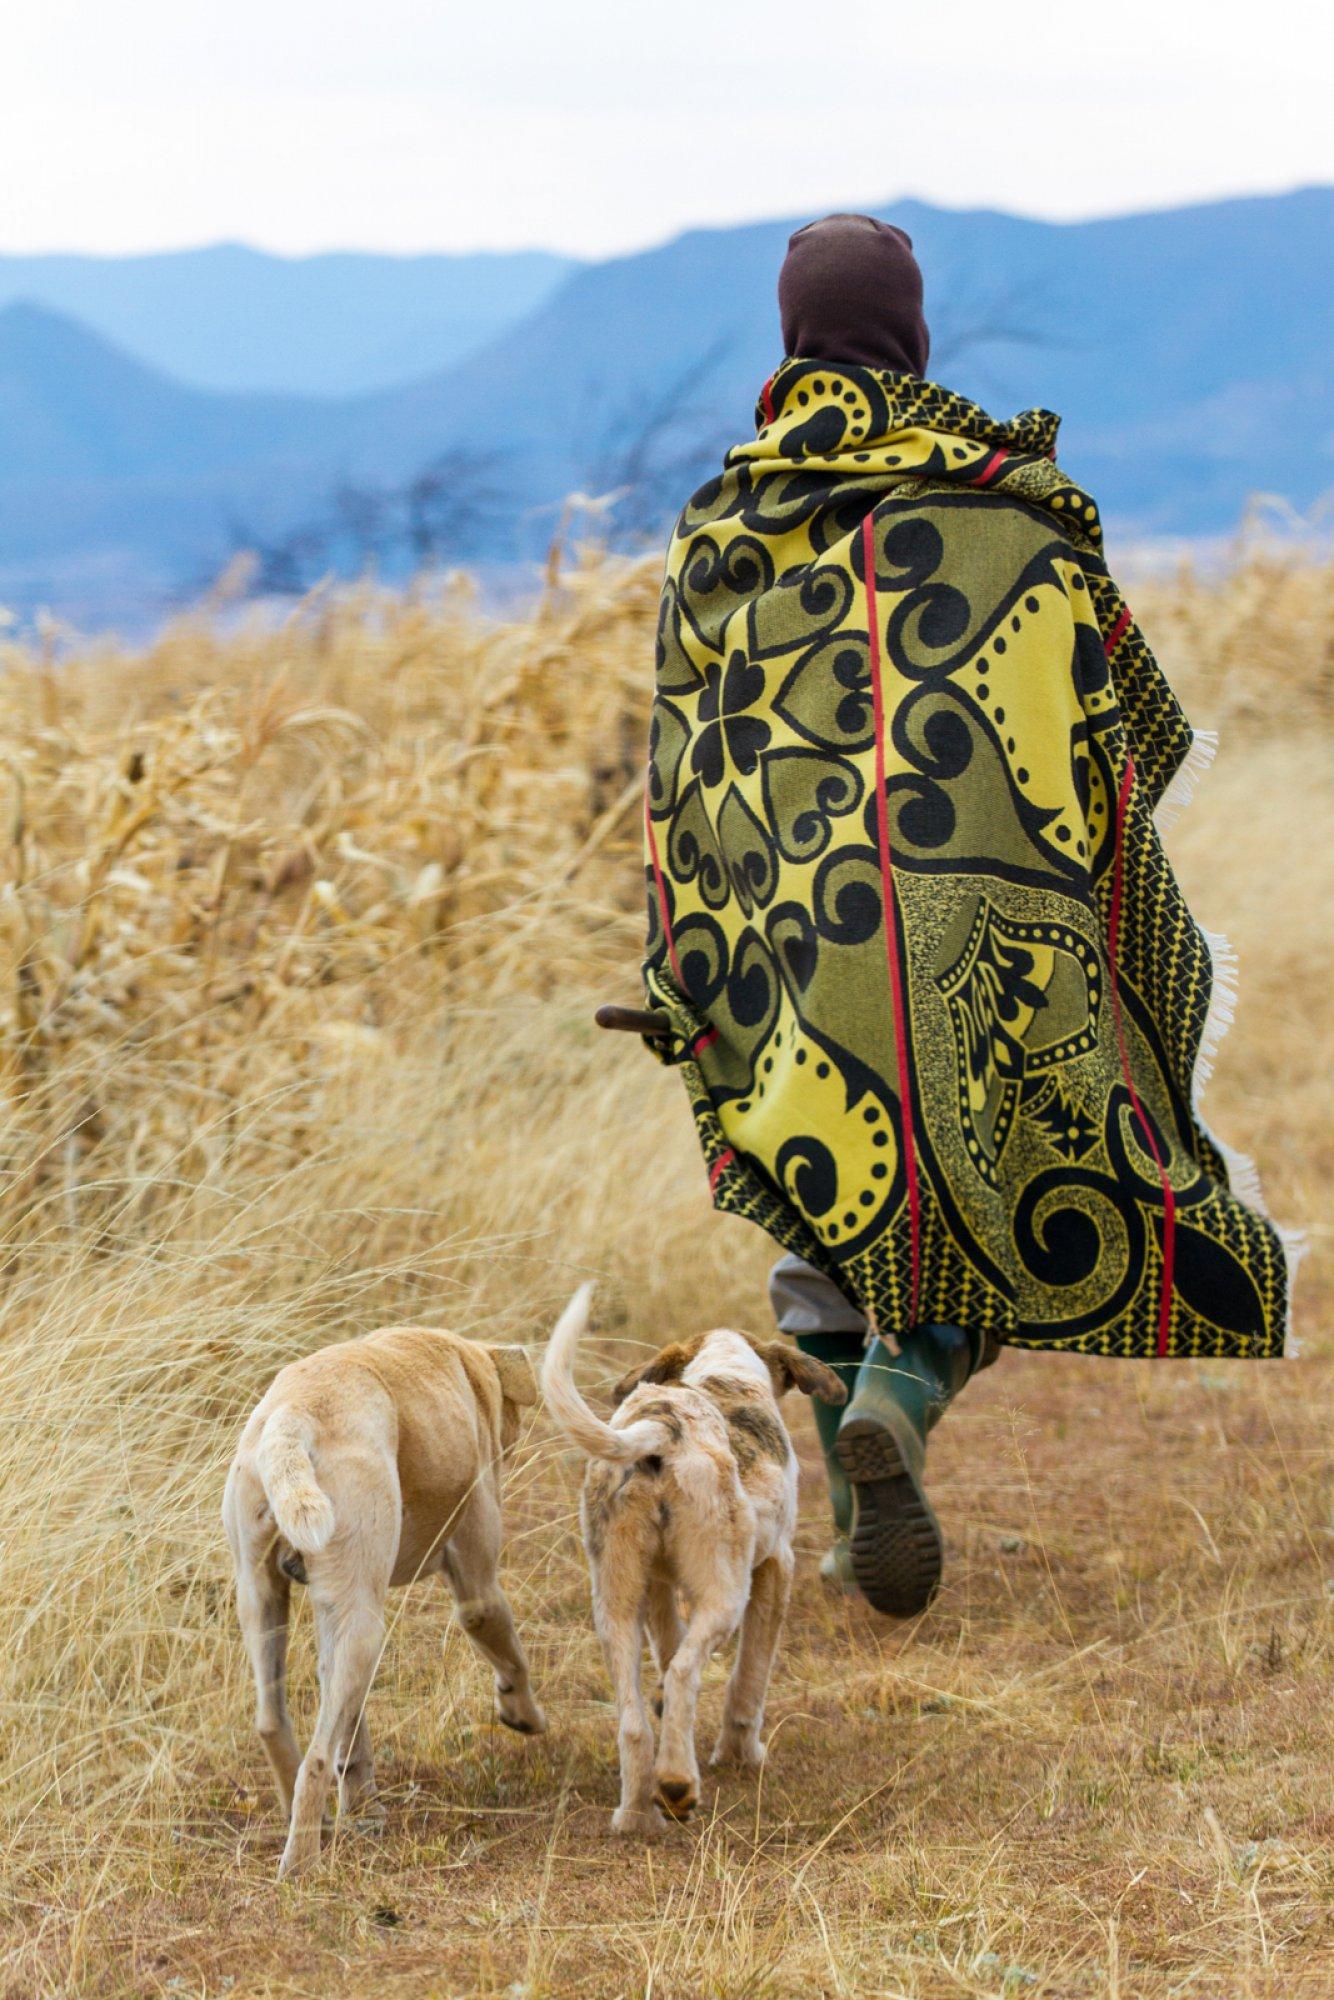 https://bubo.sk/uploads/galleries/7302/lesotho-unidentified-basotho-man-with-2-dogs-wearing-traditional-blanket-lesotho.jpg